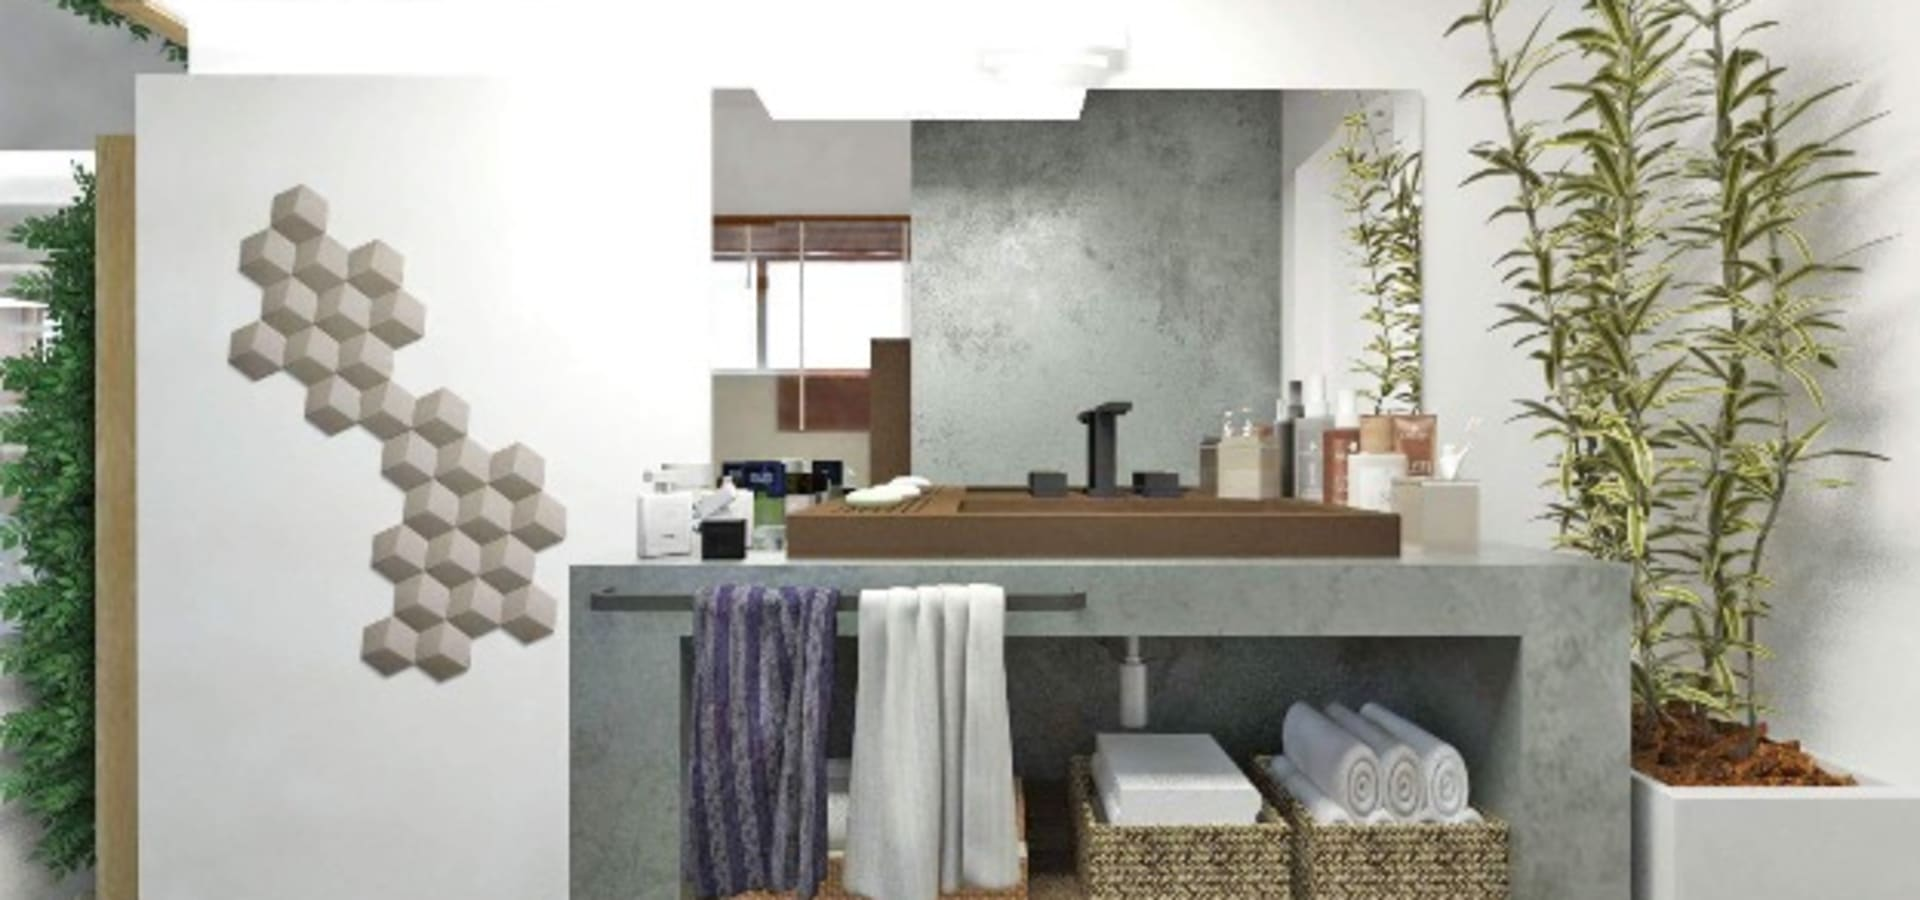 Fah Oliveira Design de Interiores